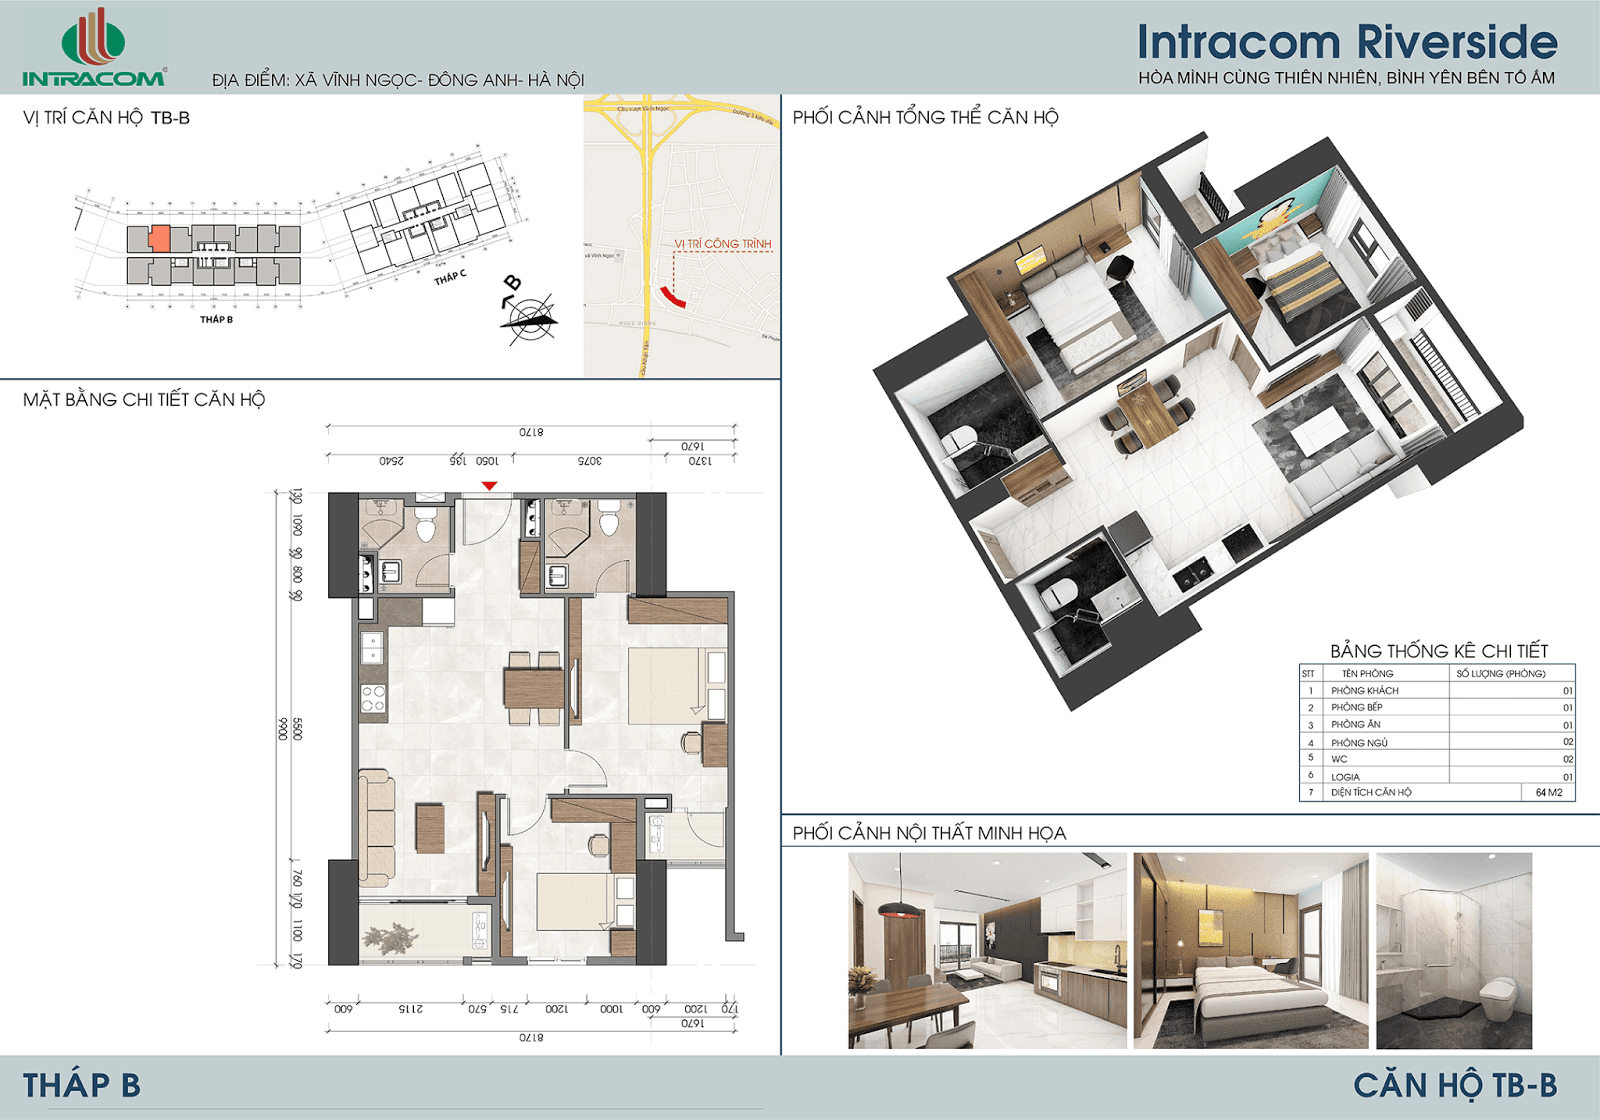 Thiết kế căn 02 - 07 - 64m2